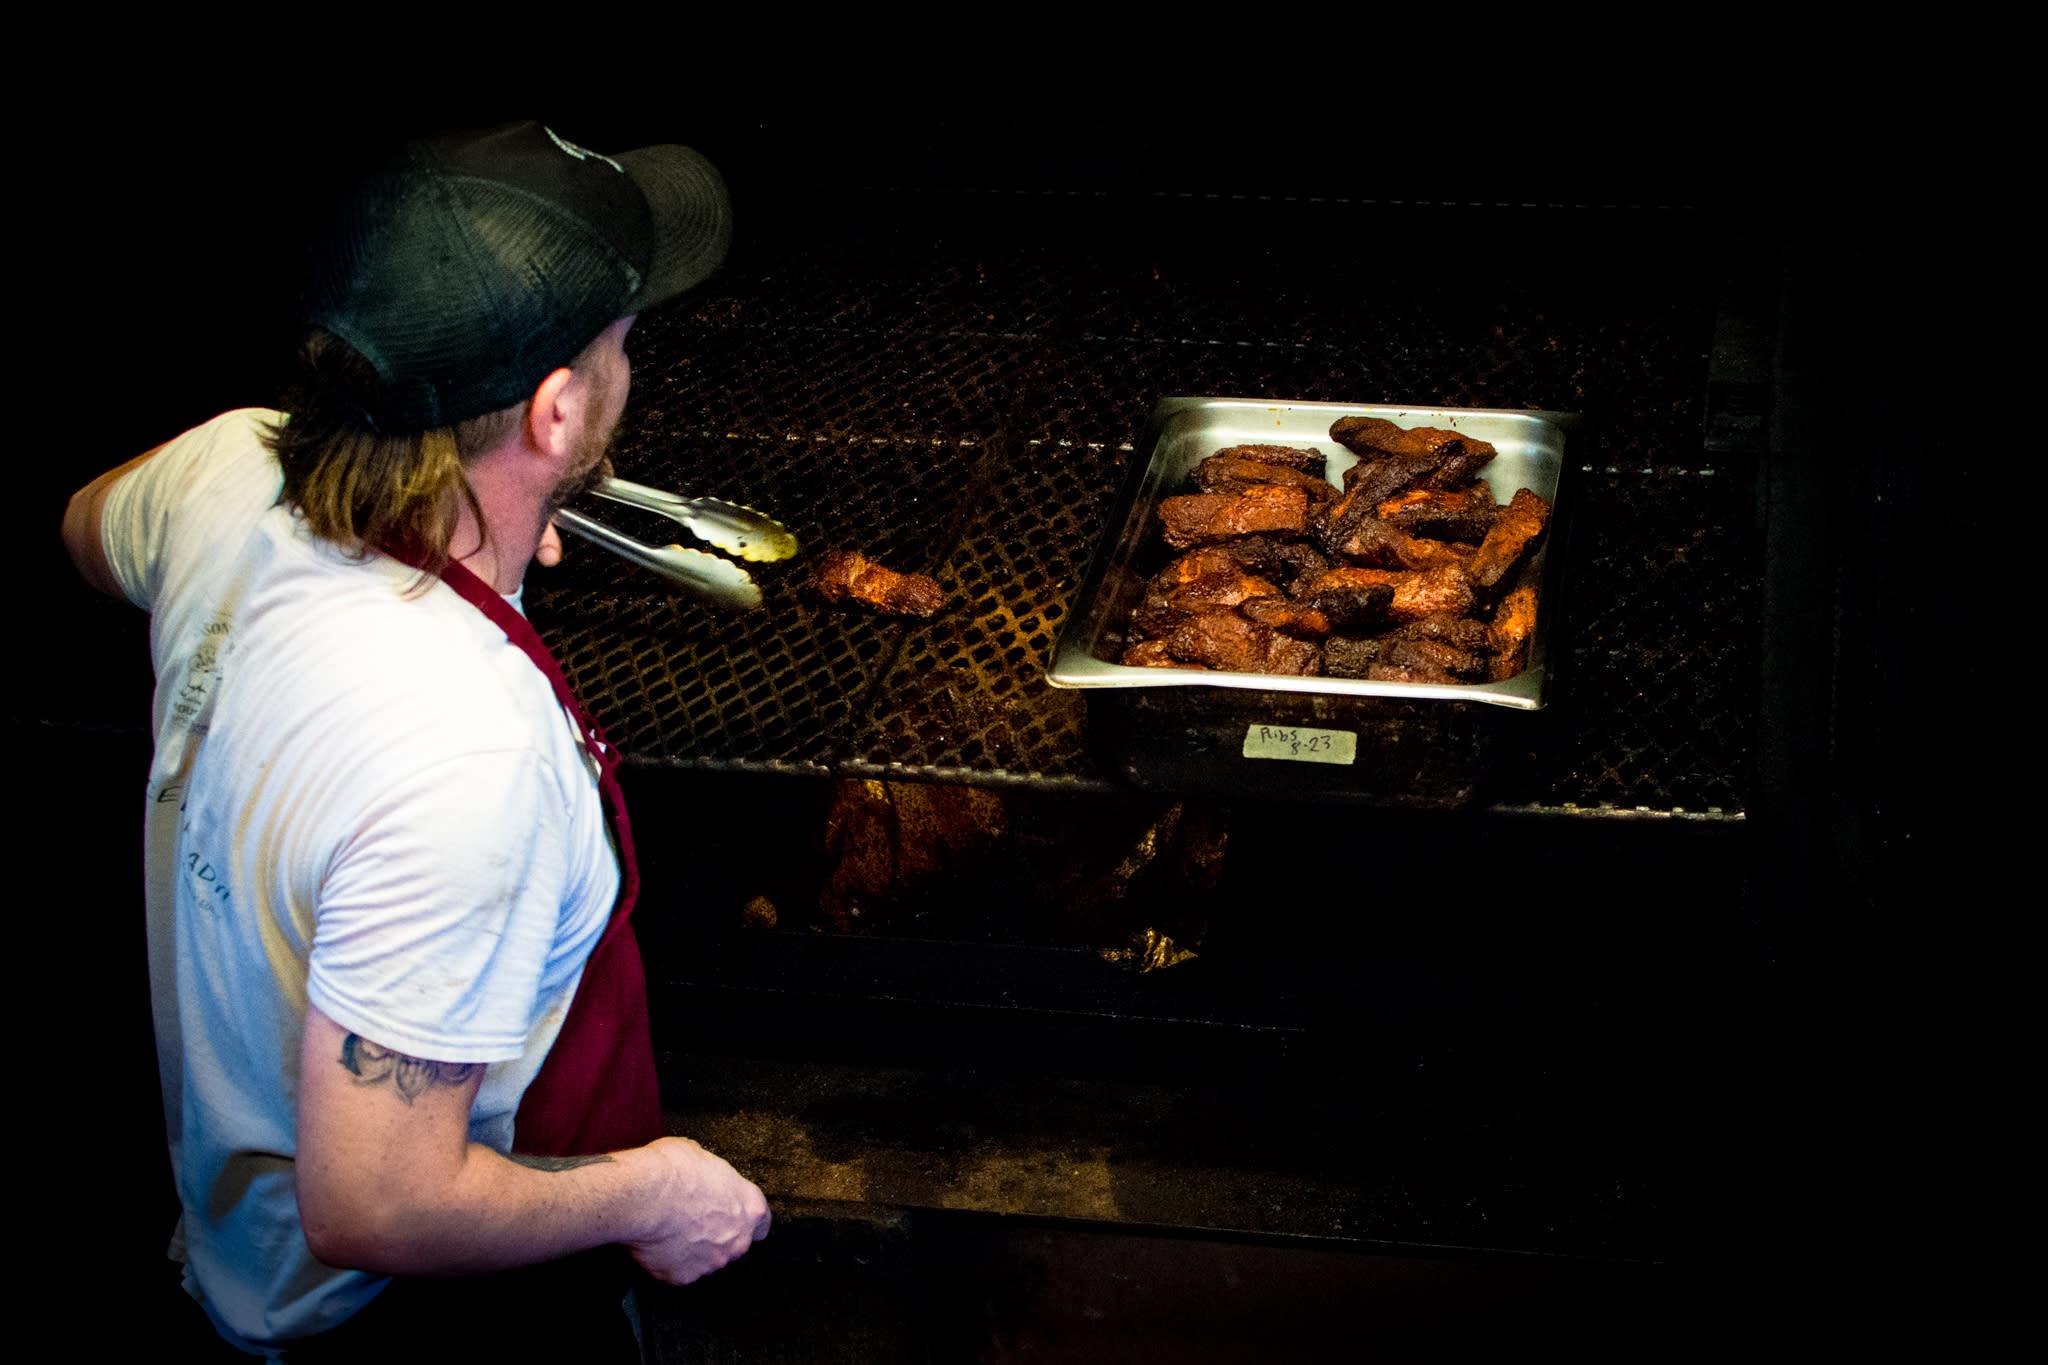 Johnson's Boucaniere Meat Smoking